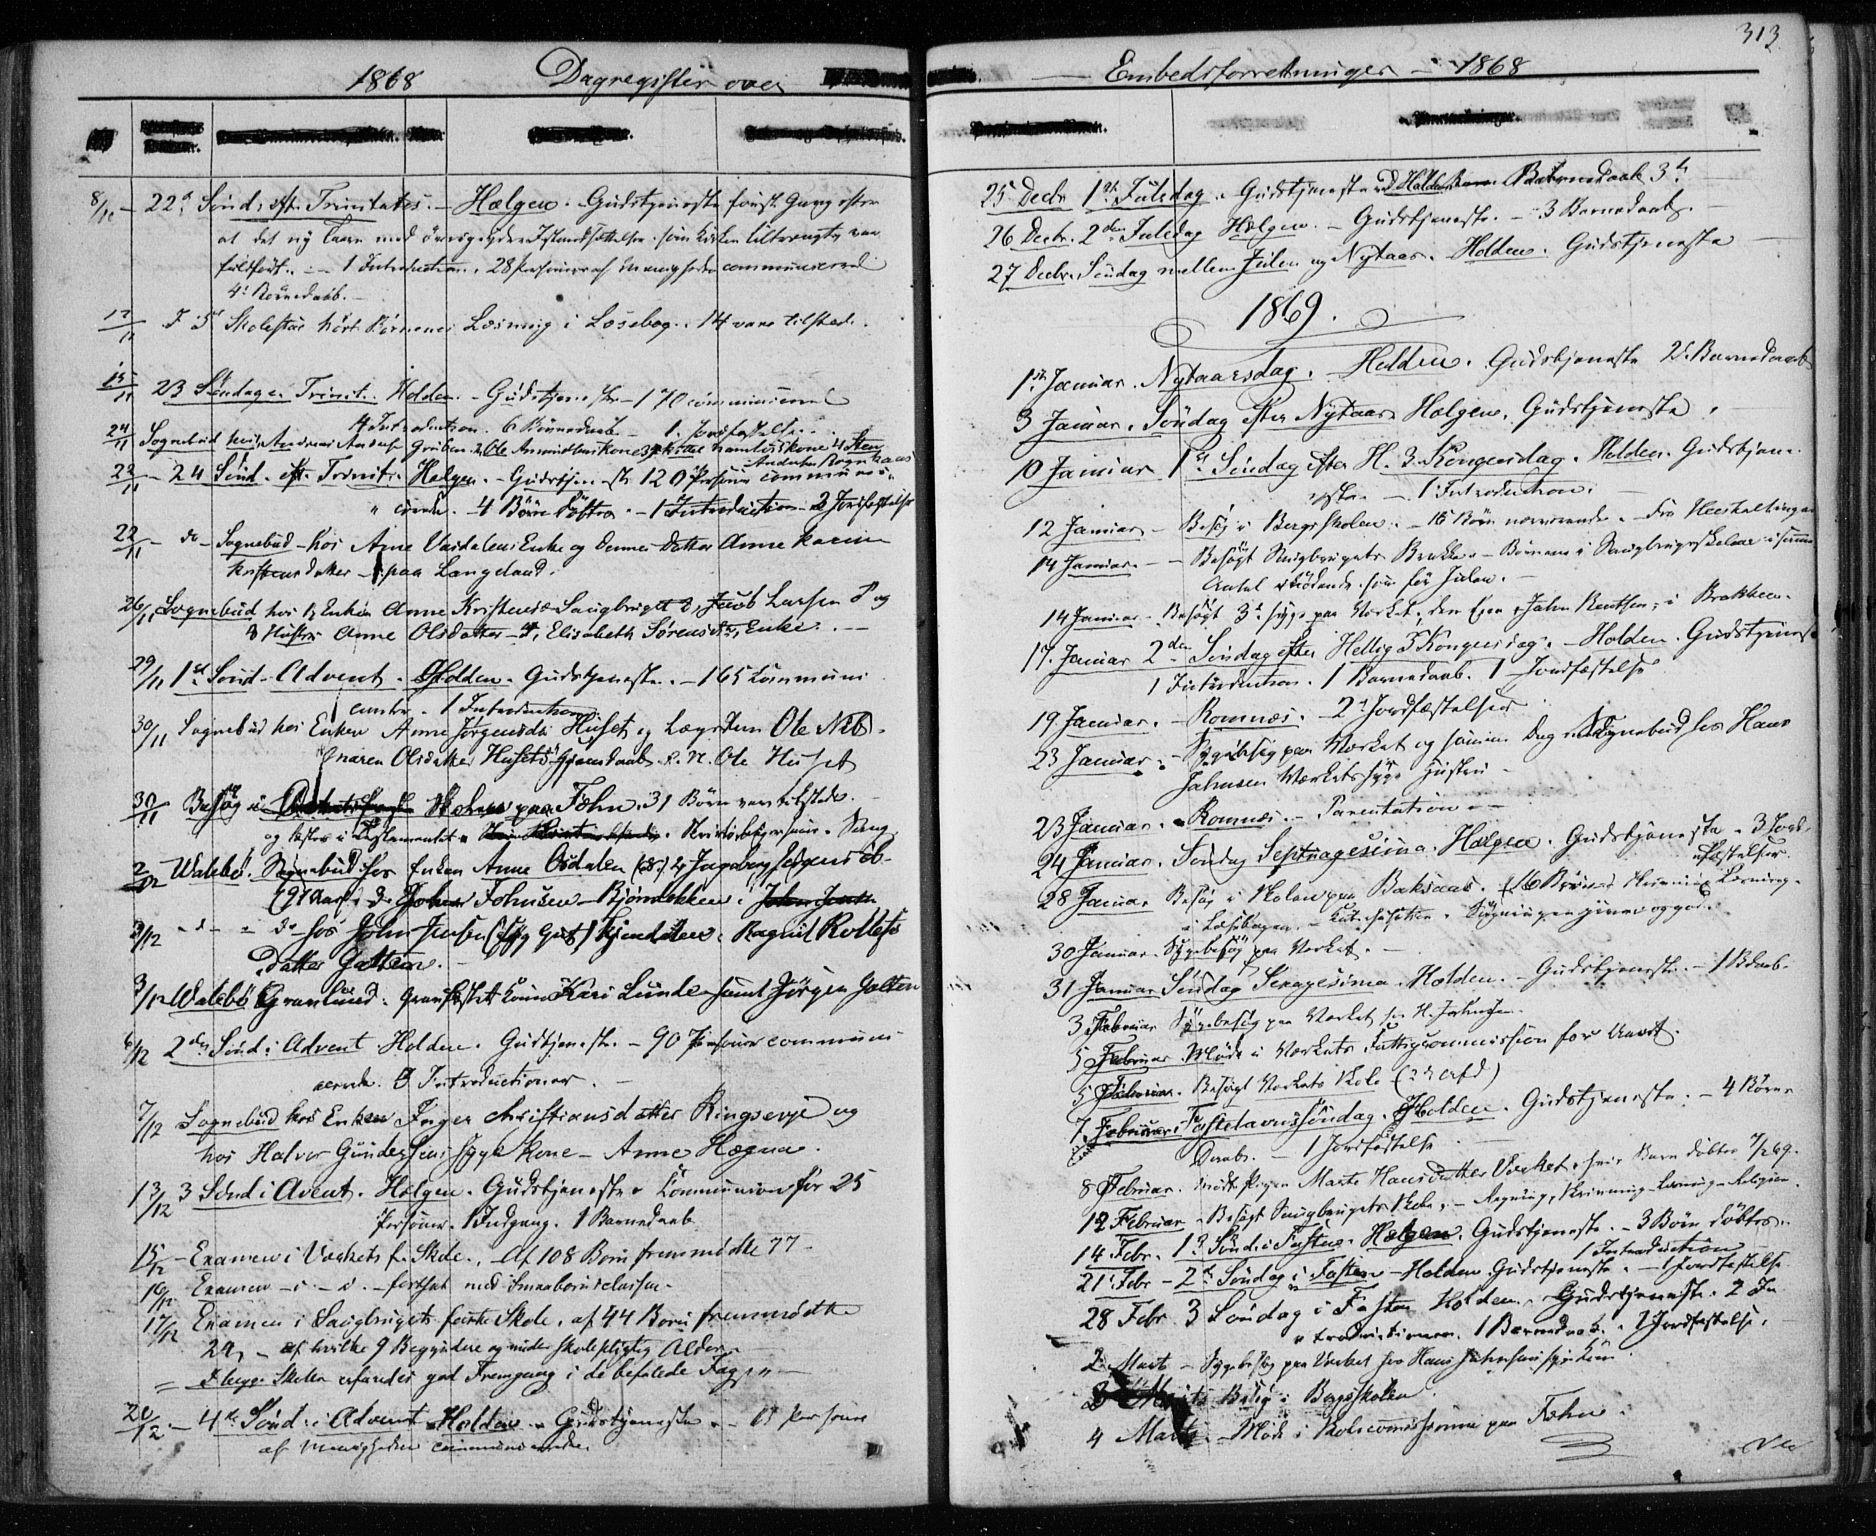 SAKO, Holla kirkebøker, F/Fa/L0006: Ministerialbok nr. 6, 1861-1869, s. 313